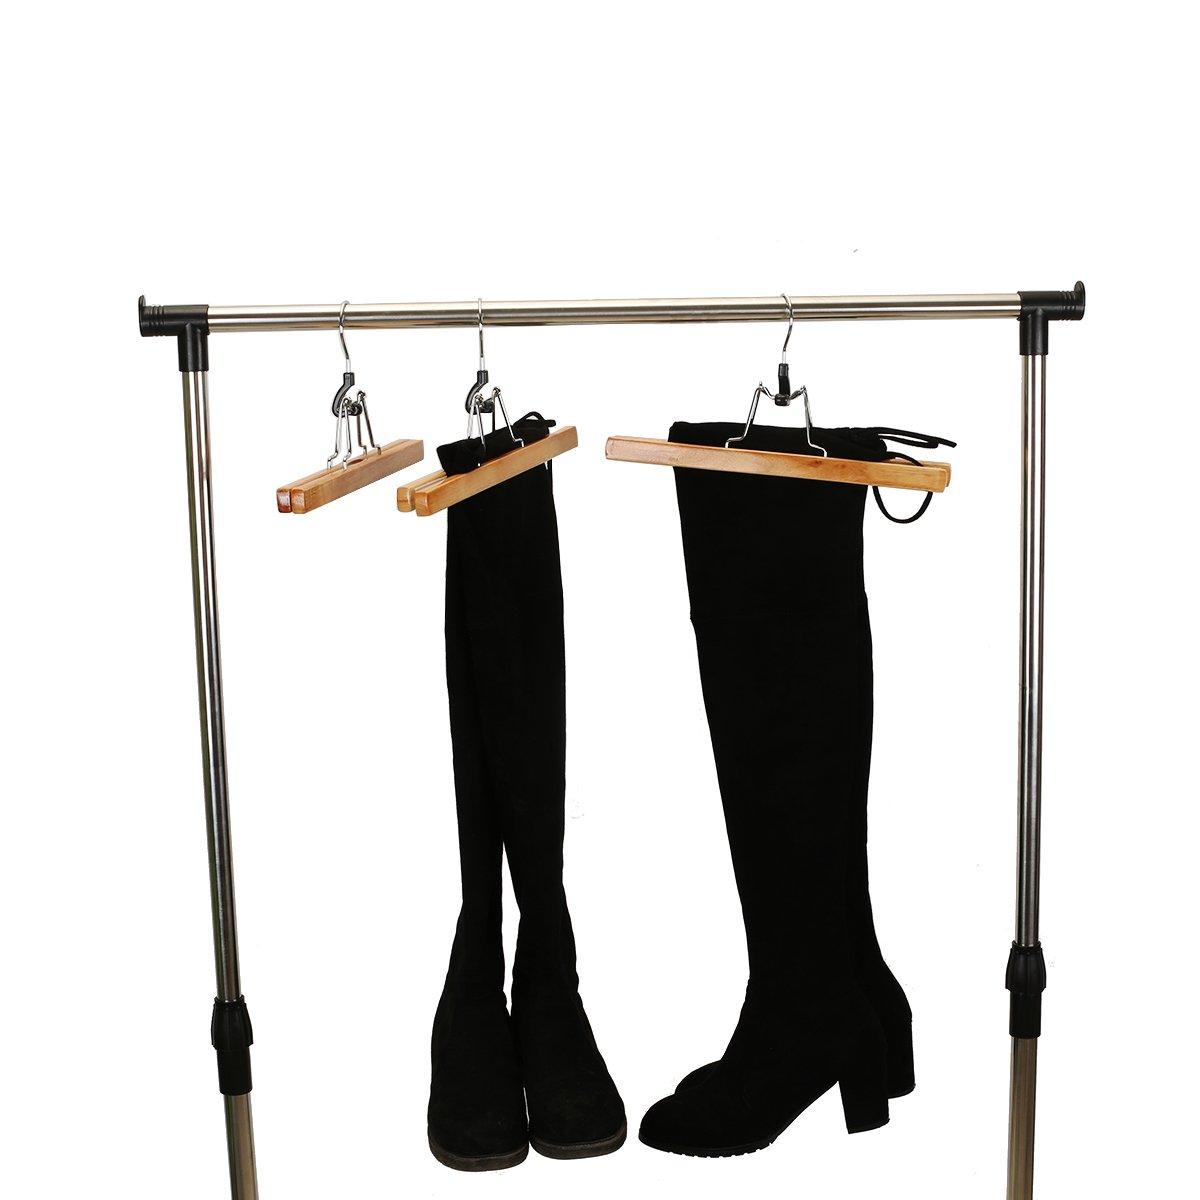 Pants Shorts,Natural Finish Slacks meqution Wood Pants Skirt Hanger,Natural Solid Wooden Collection Slack Hangers with Anti-Rust Hook for Skirts Set of 8 Jeans